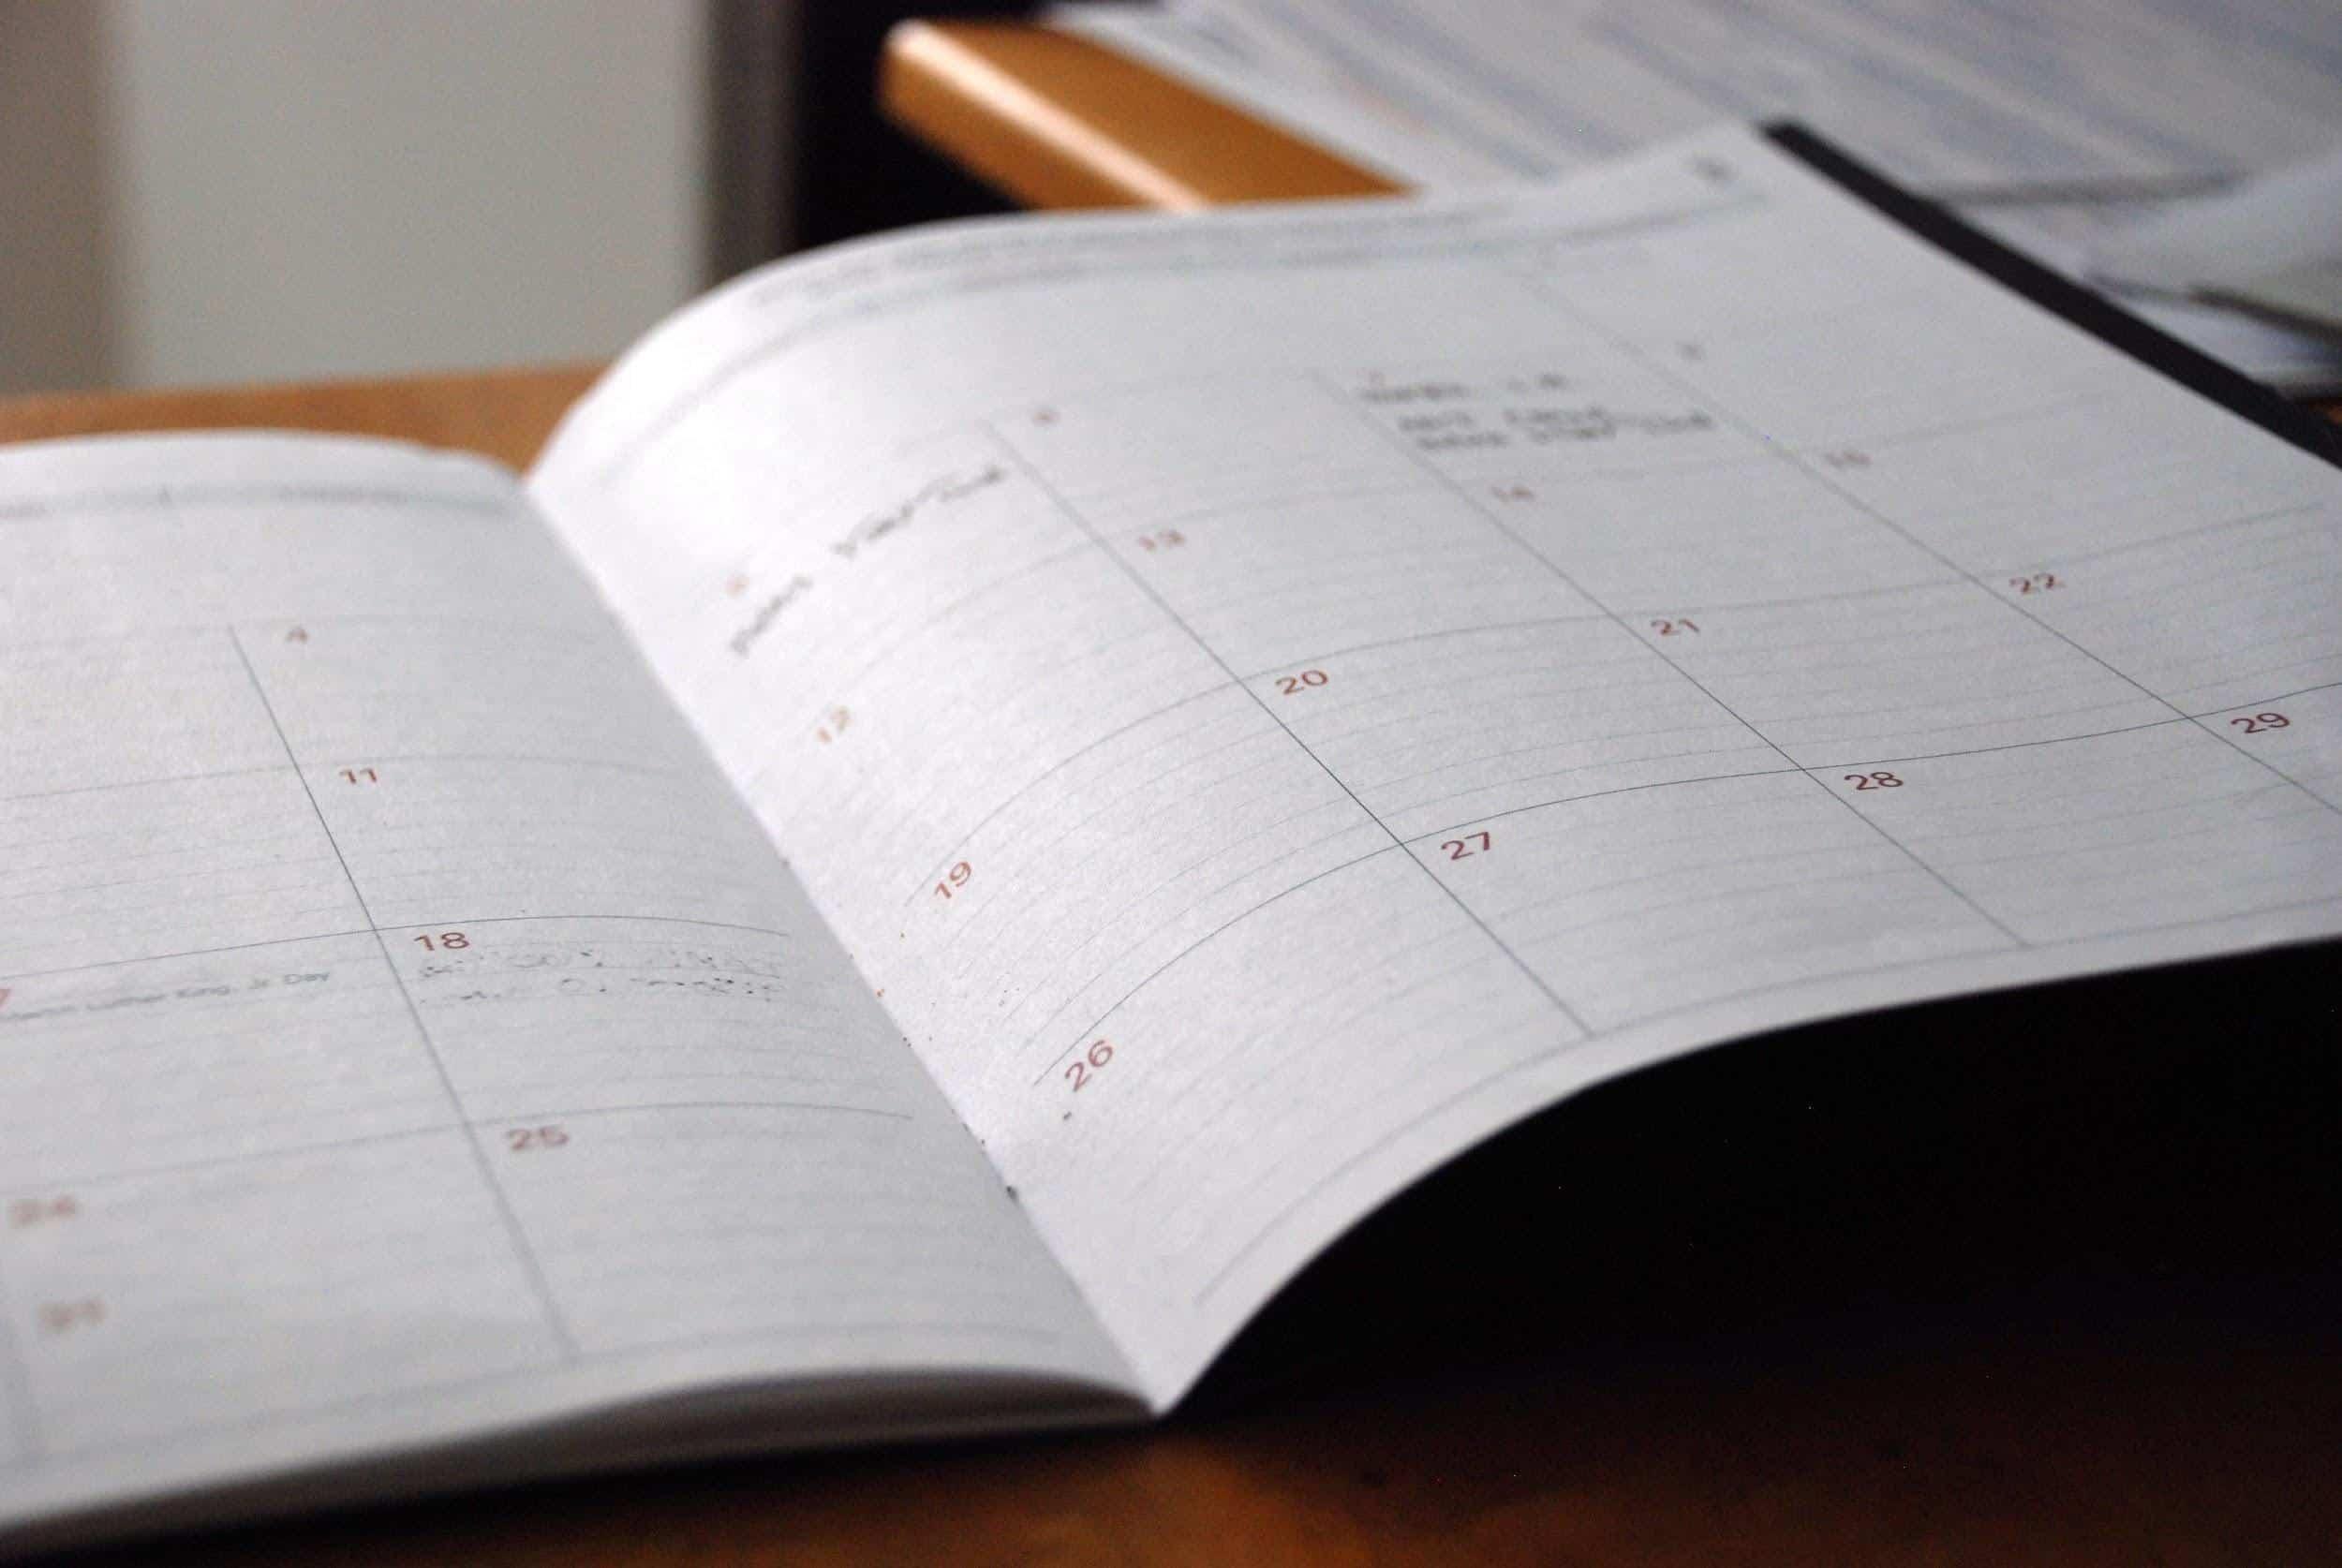 Schedule notes